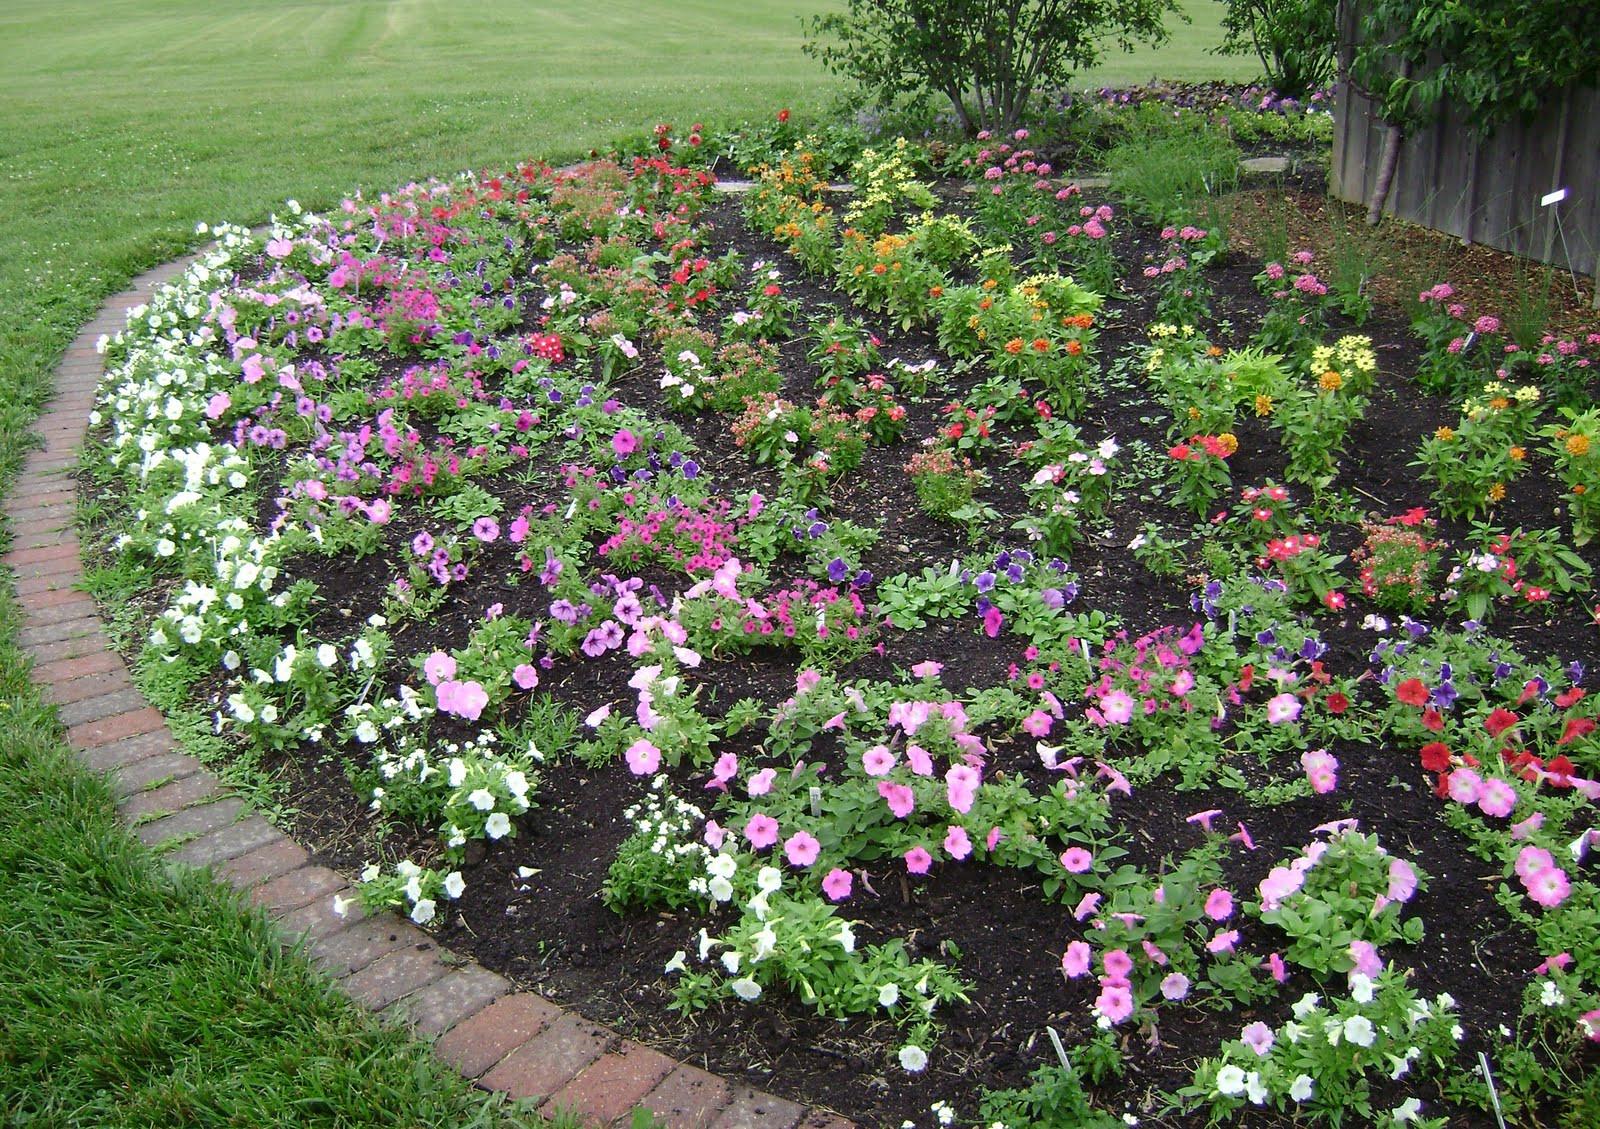 Best ideas about Rose Garden Ideas . Save or Pin Rose Garden Ideas Now.